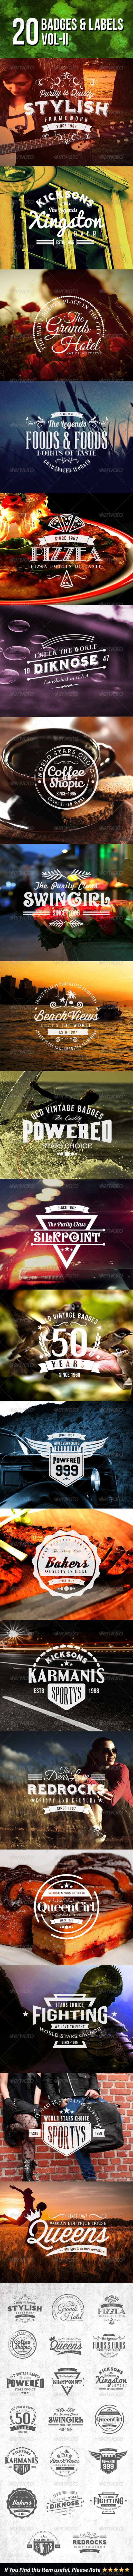 20 Badges and Labels Vol II - Badges & Stickers Web Elements